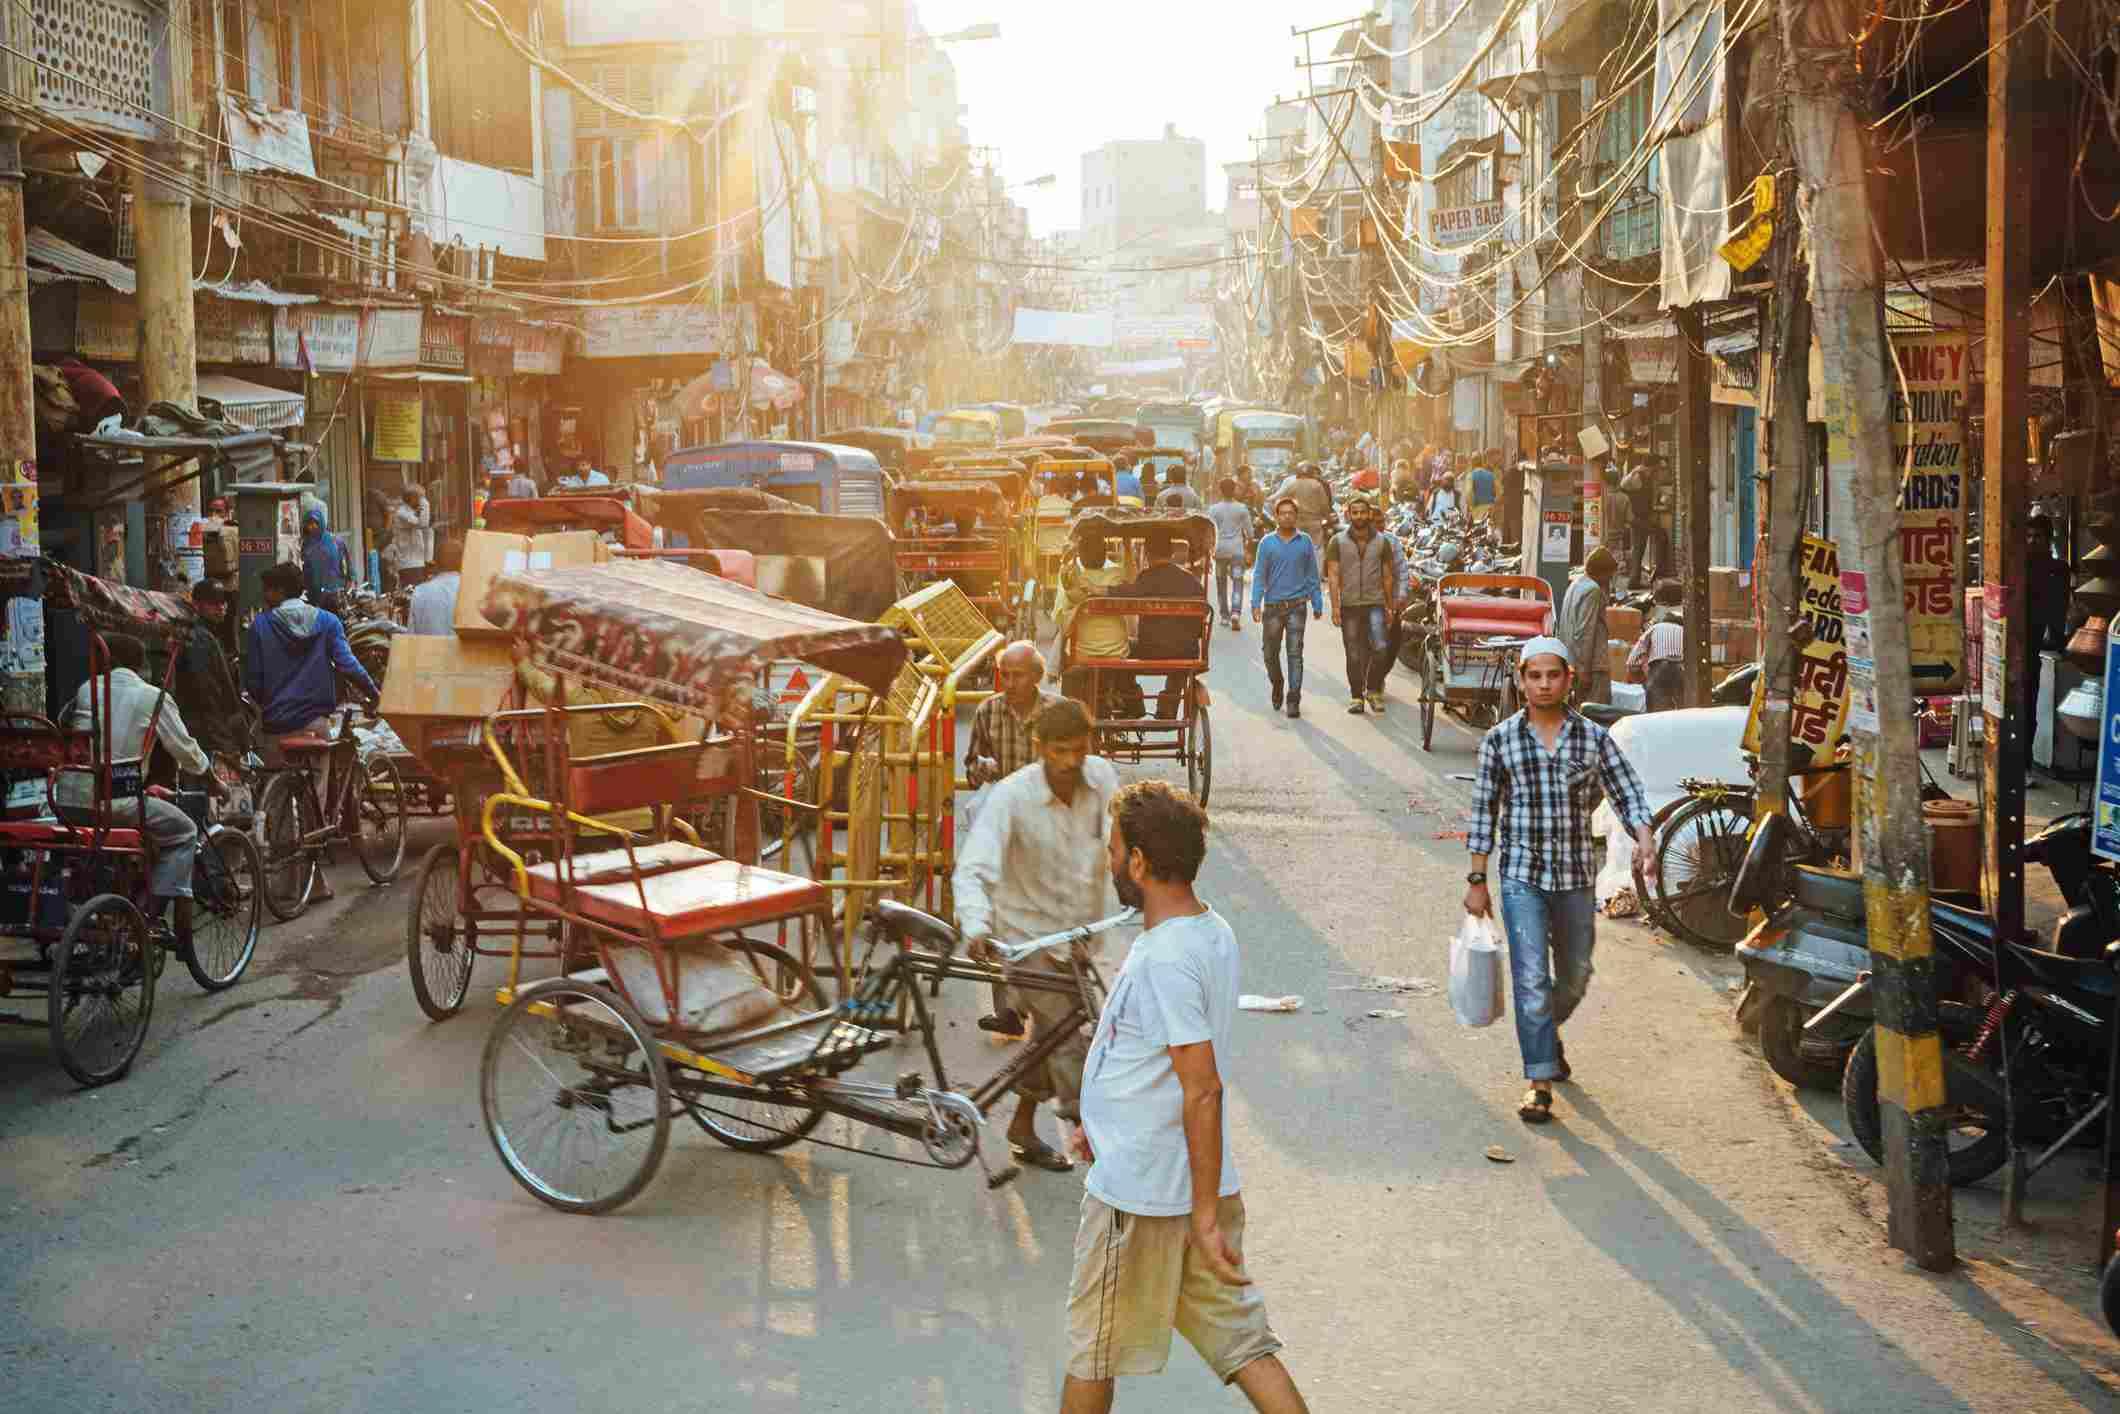 People walking around Old Delhi street.